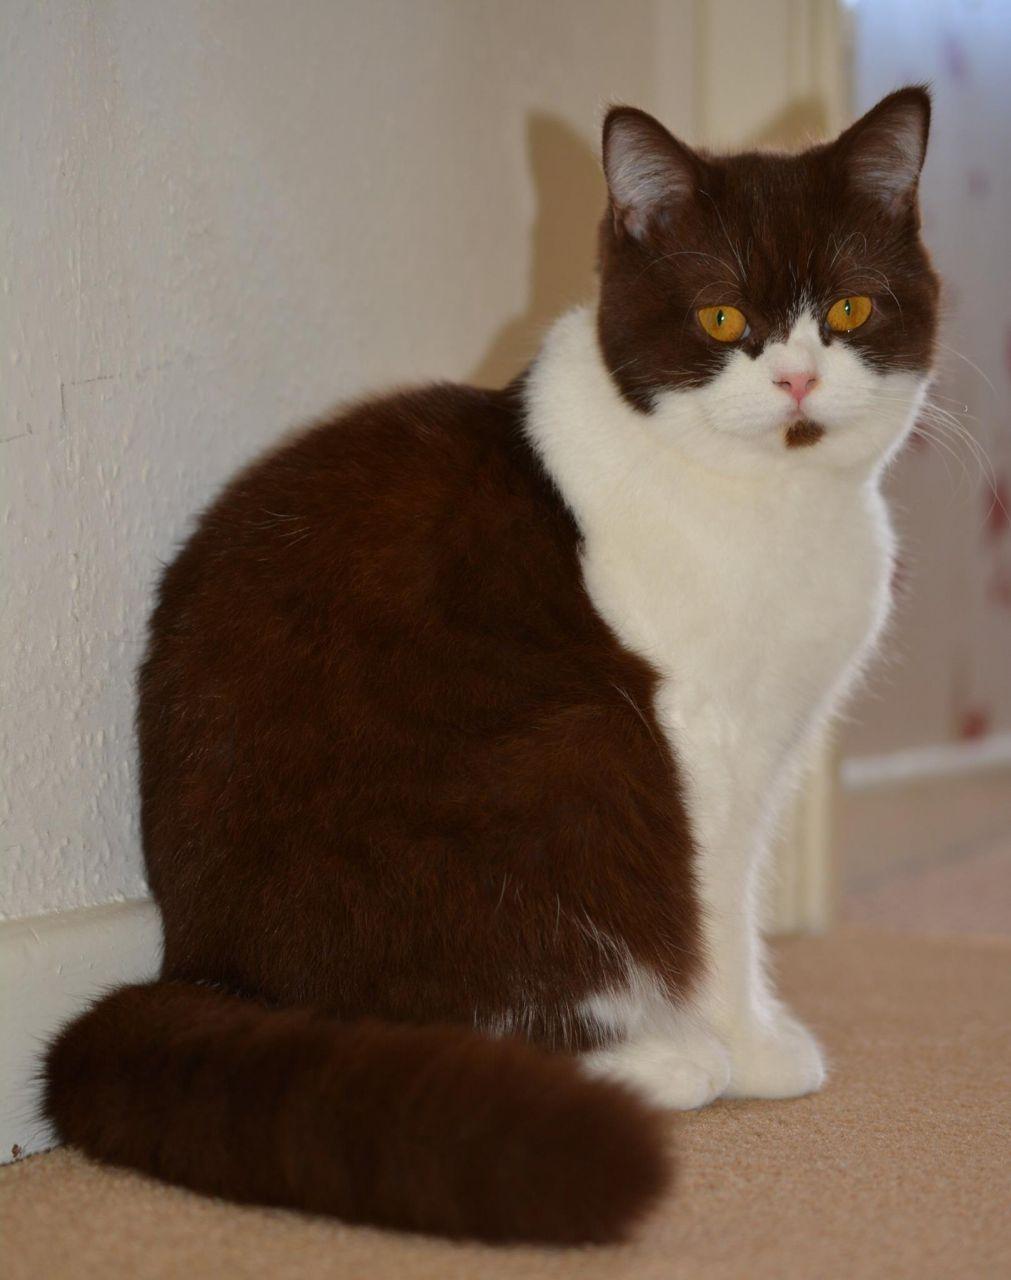 Brown/white British shorthair cat British shorthair cats